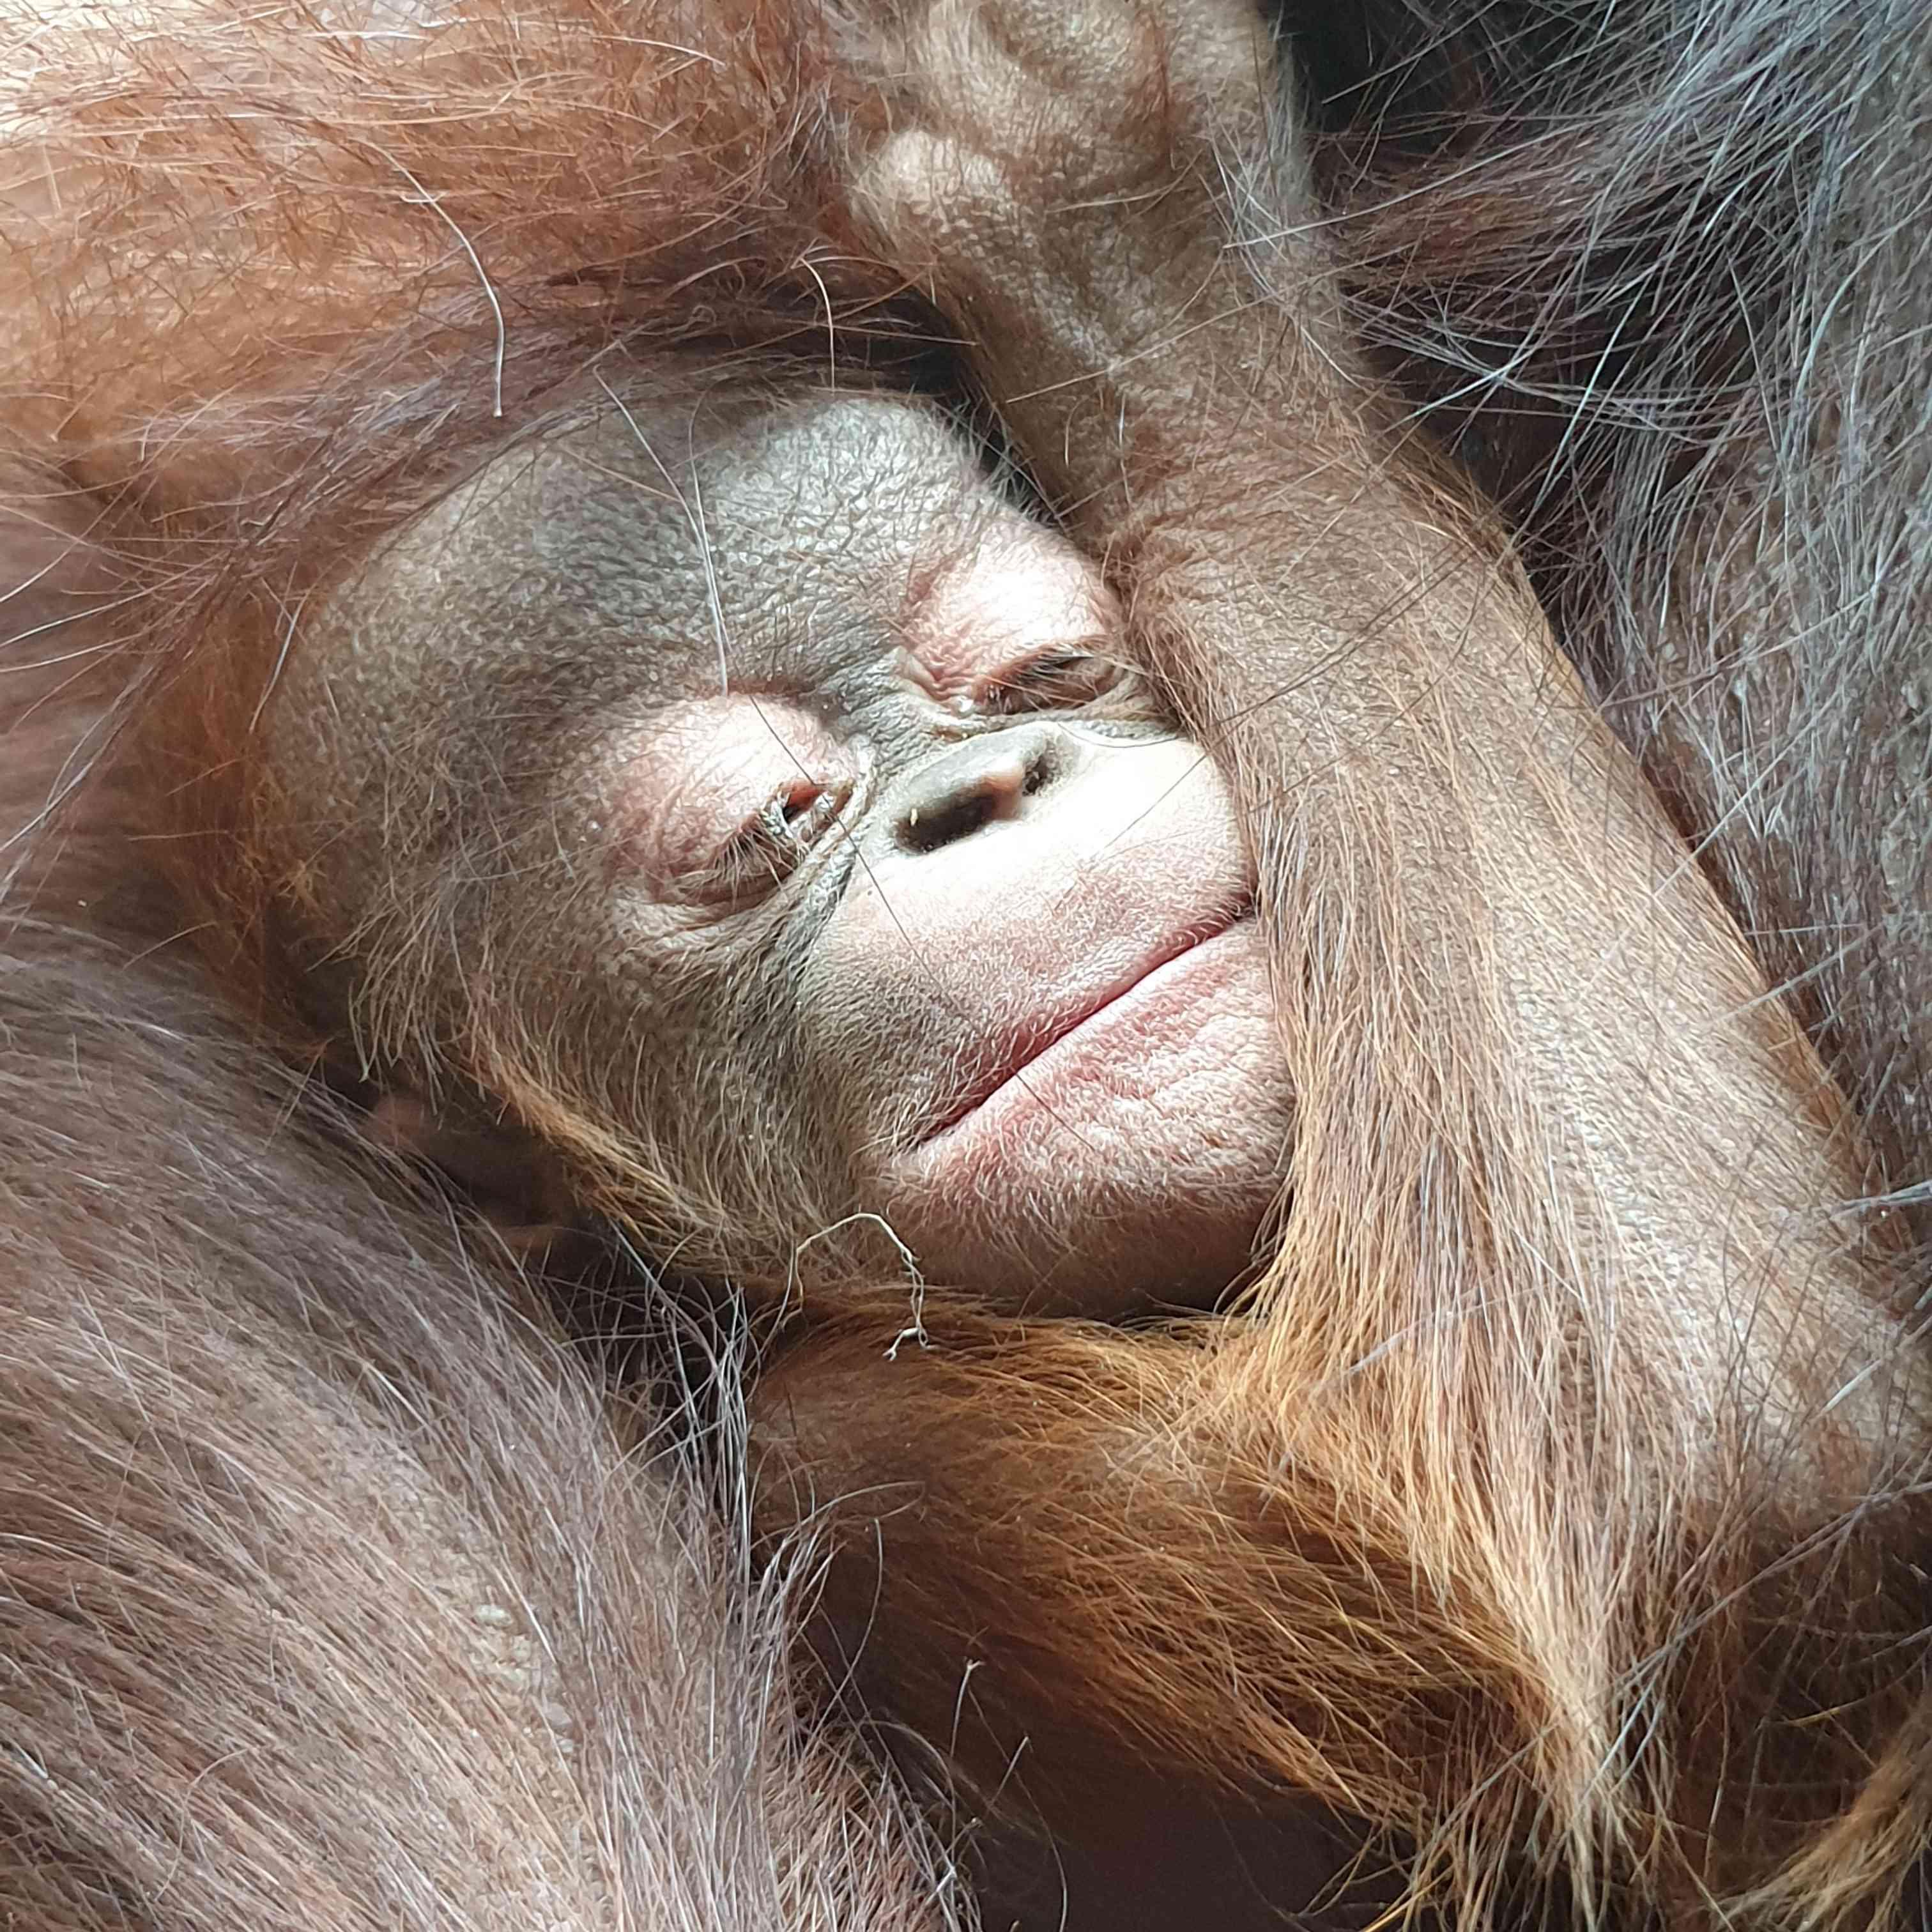 orangutan baby at Chester Zoo